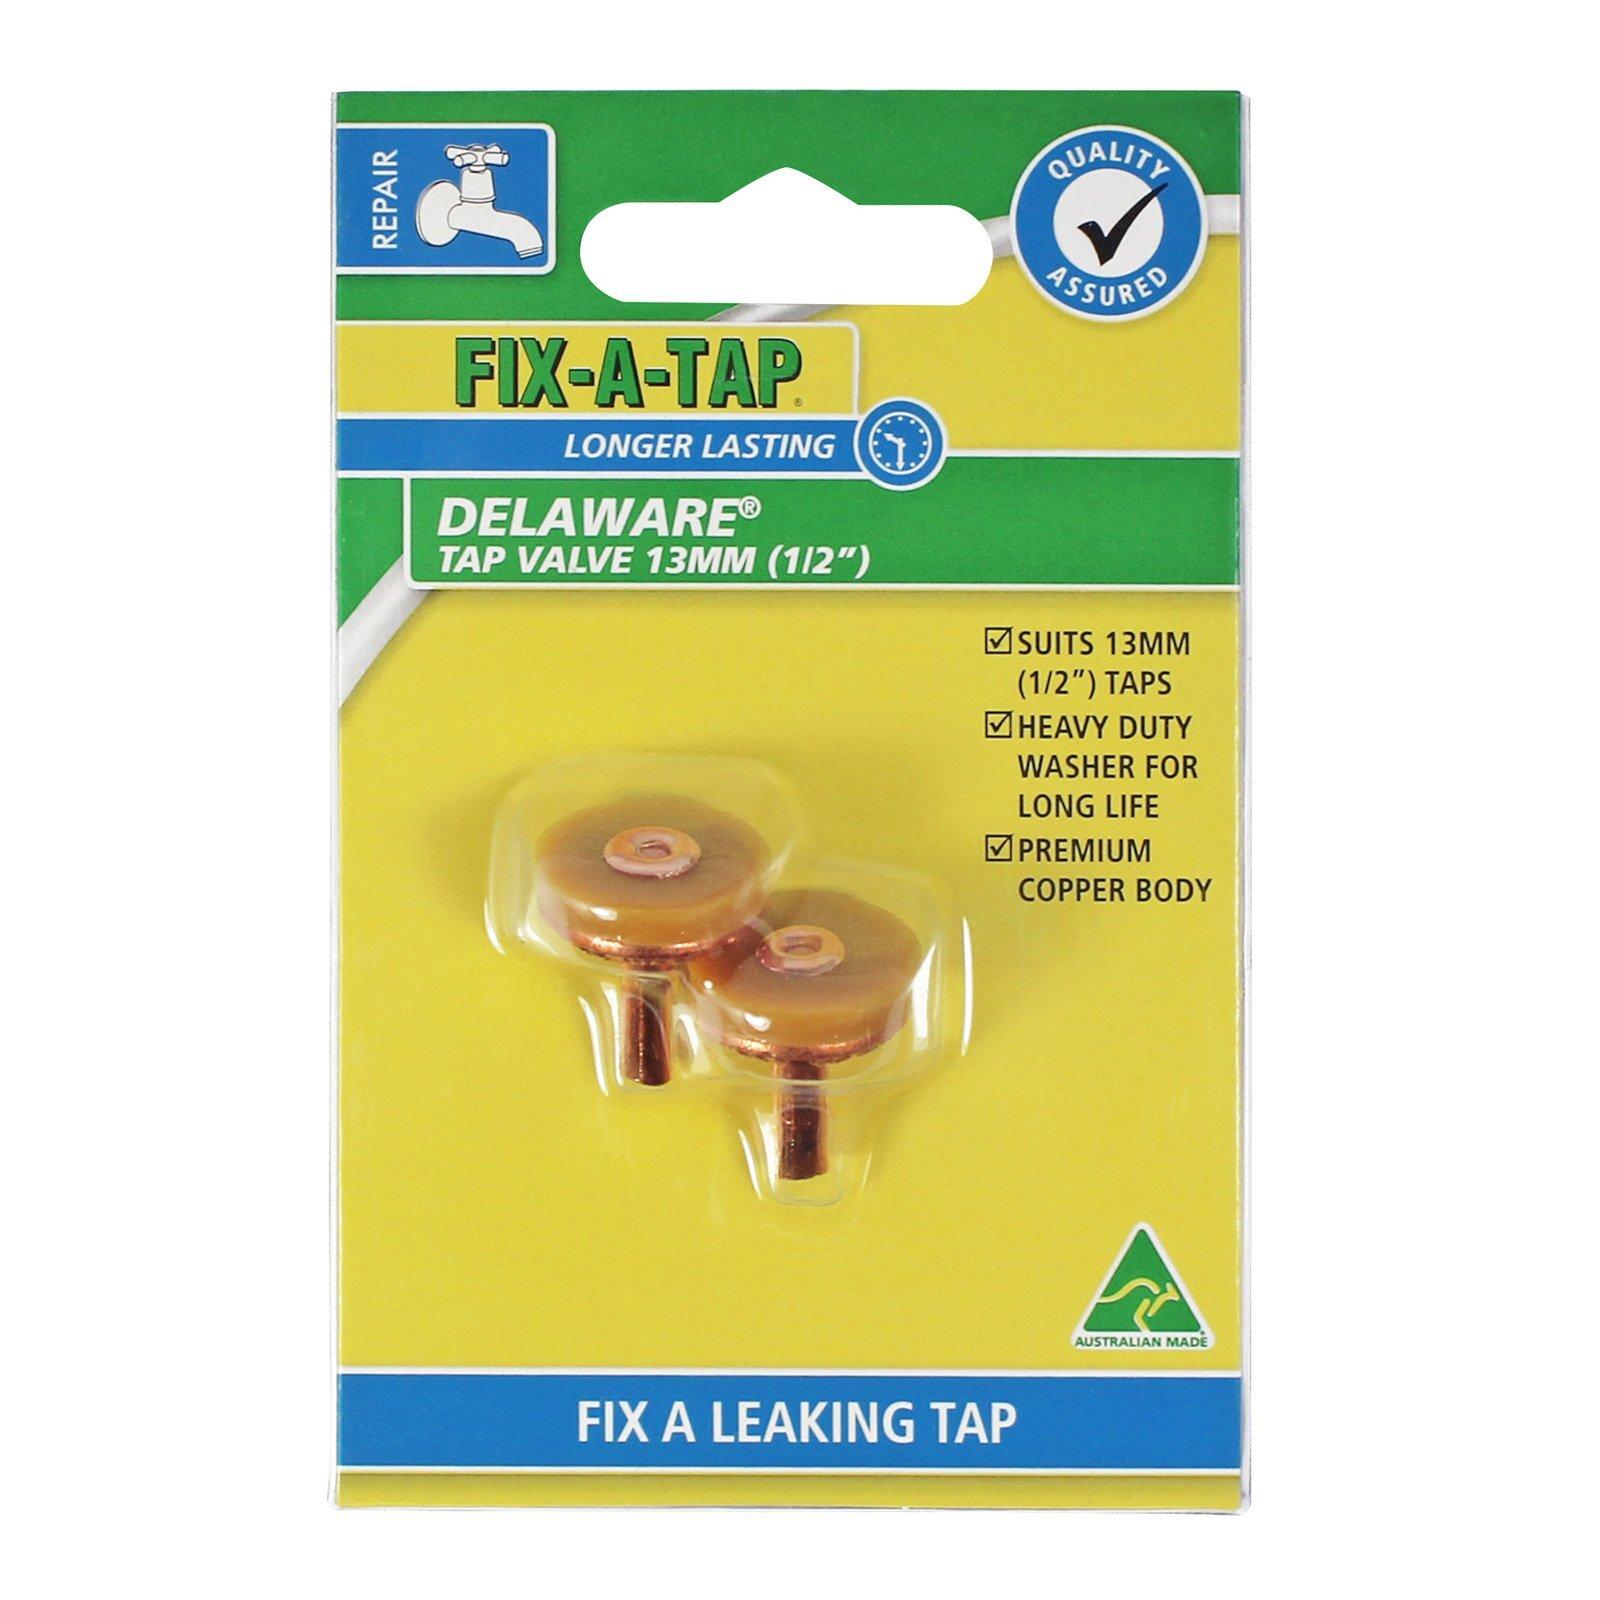 FIX-A-TAP 13mm Delaware Tap Valve - 2 Pack